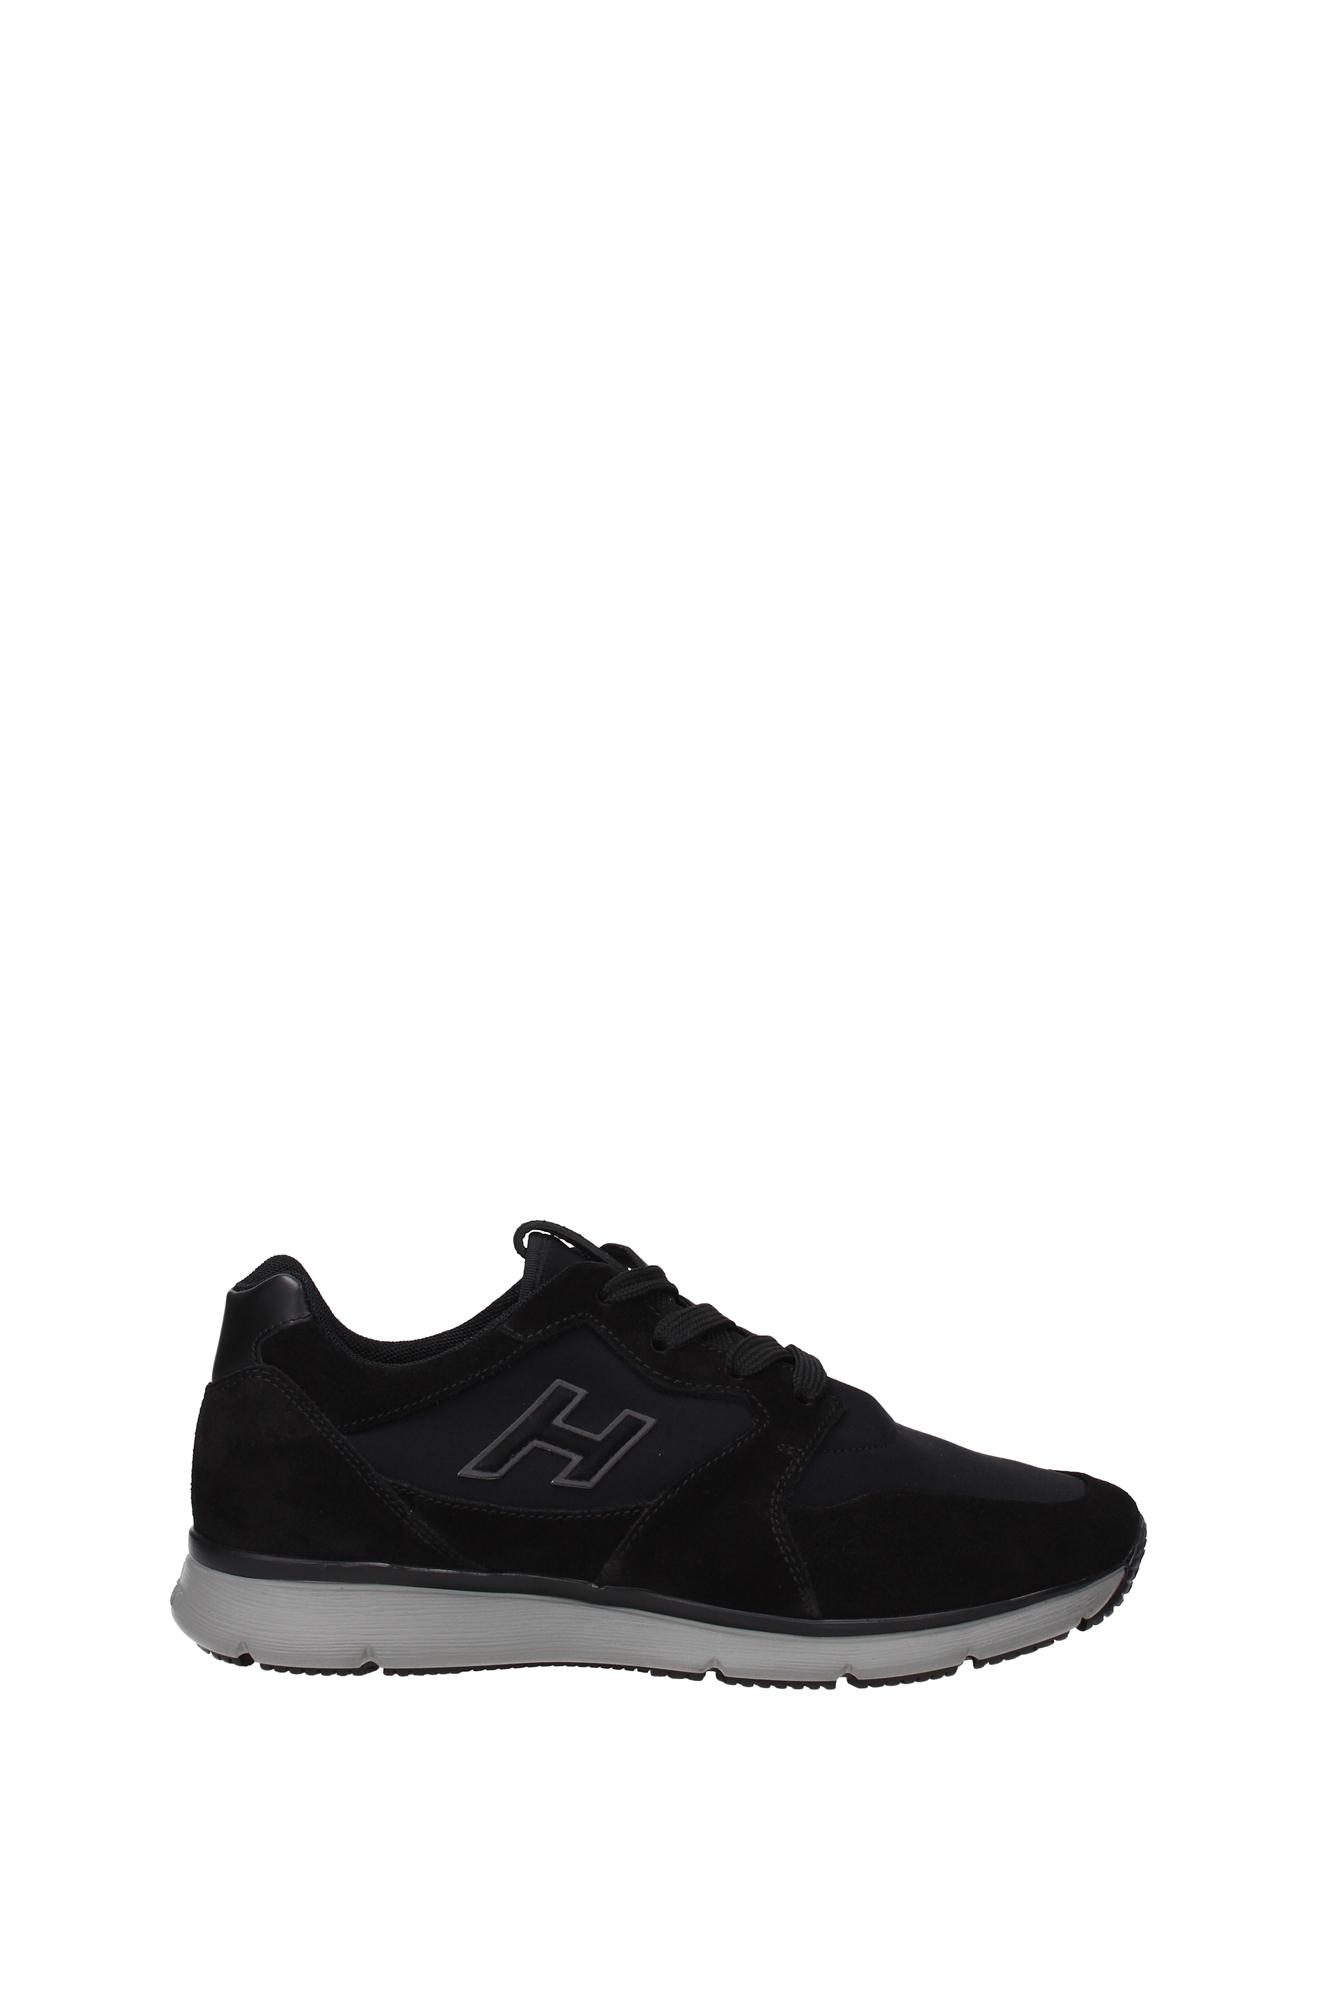 Sneakers Hogan Herren - - - Wildleder (HXM2540U141E55B999) bb576d